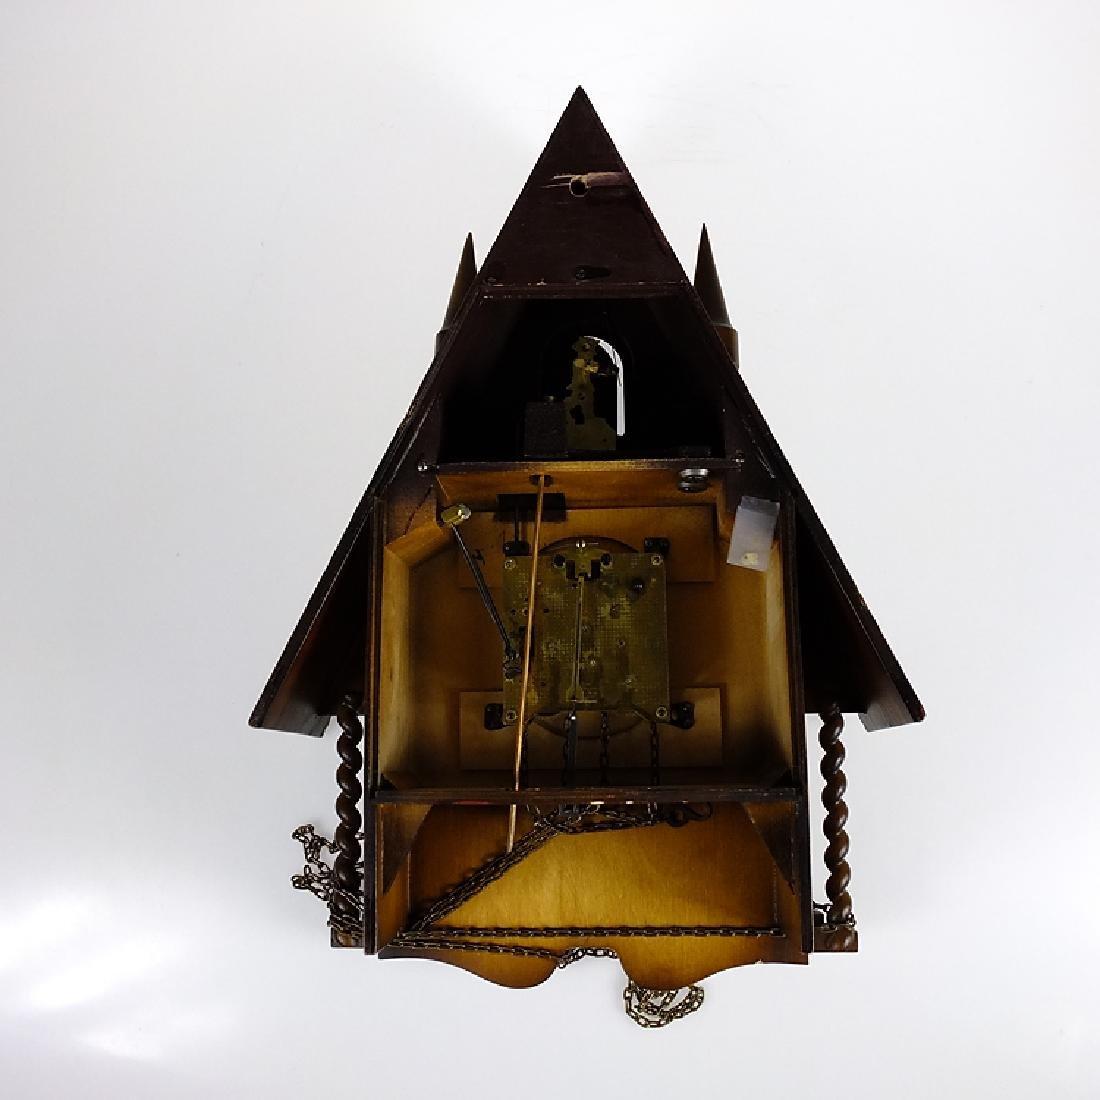 Cuckoo Clock Mfg Co LINDEN 8-DAY CLOCK BLACK FOREST - 3